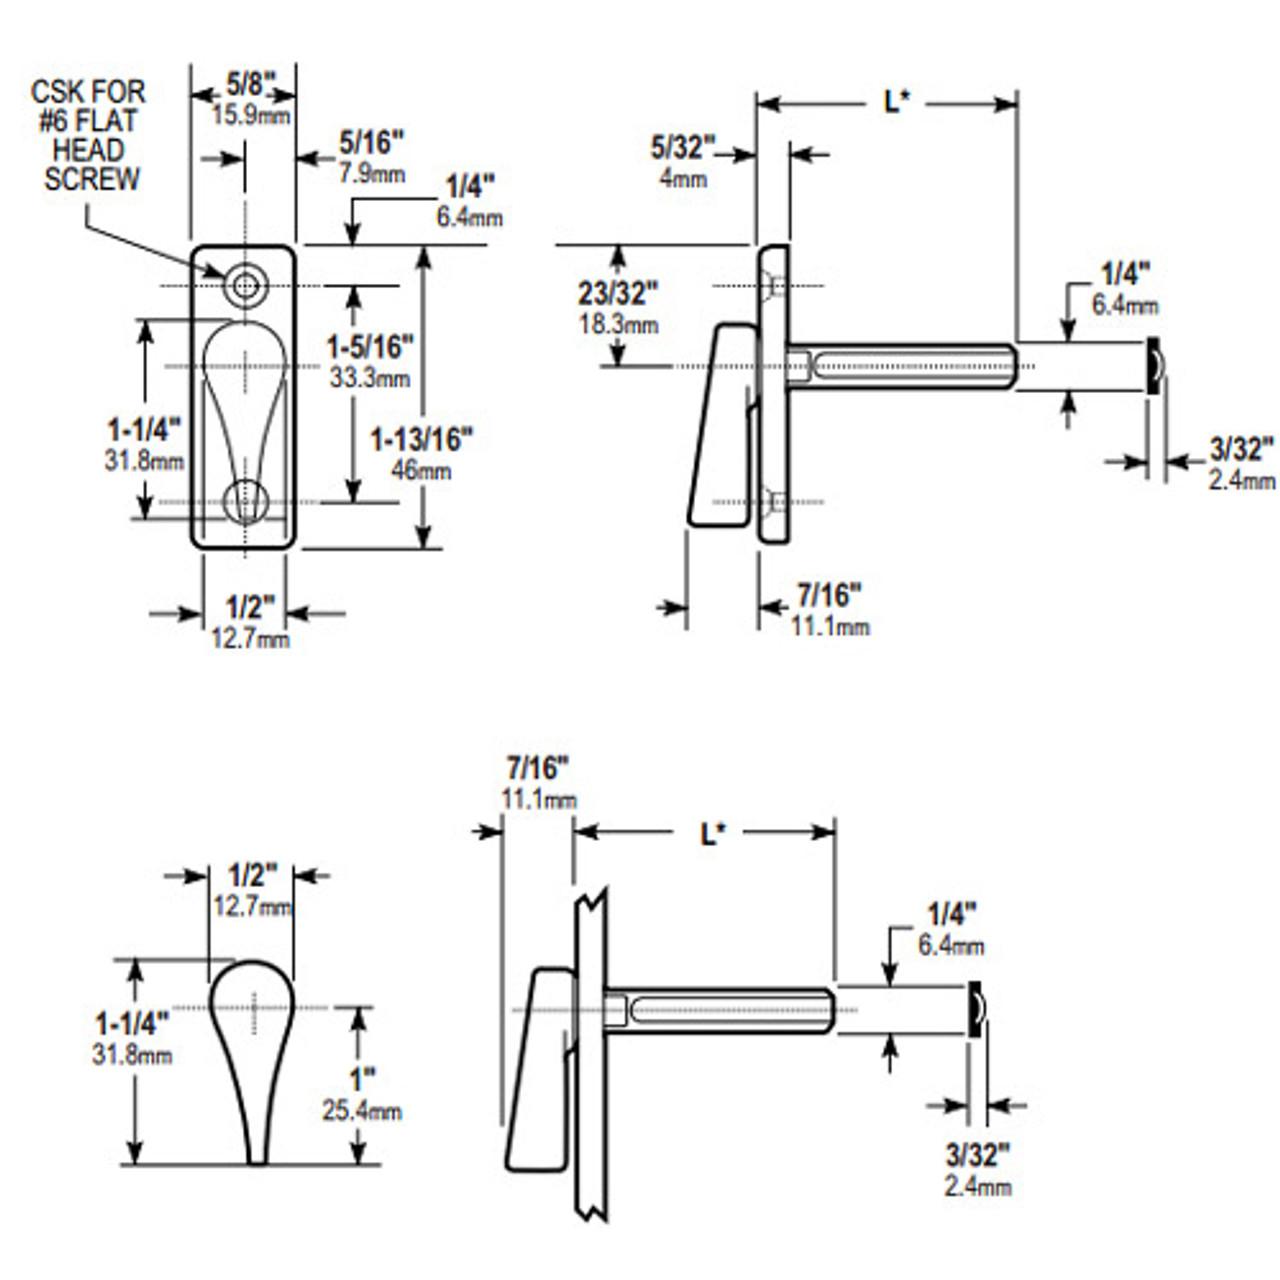 1000-02-19-119 Adams Rite 1000 Series Turns Dimensional View